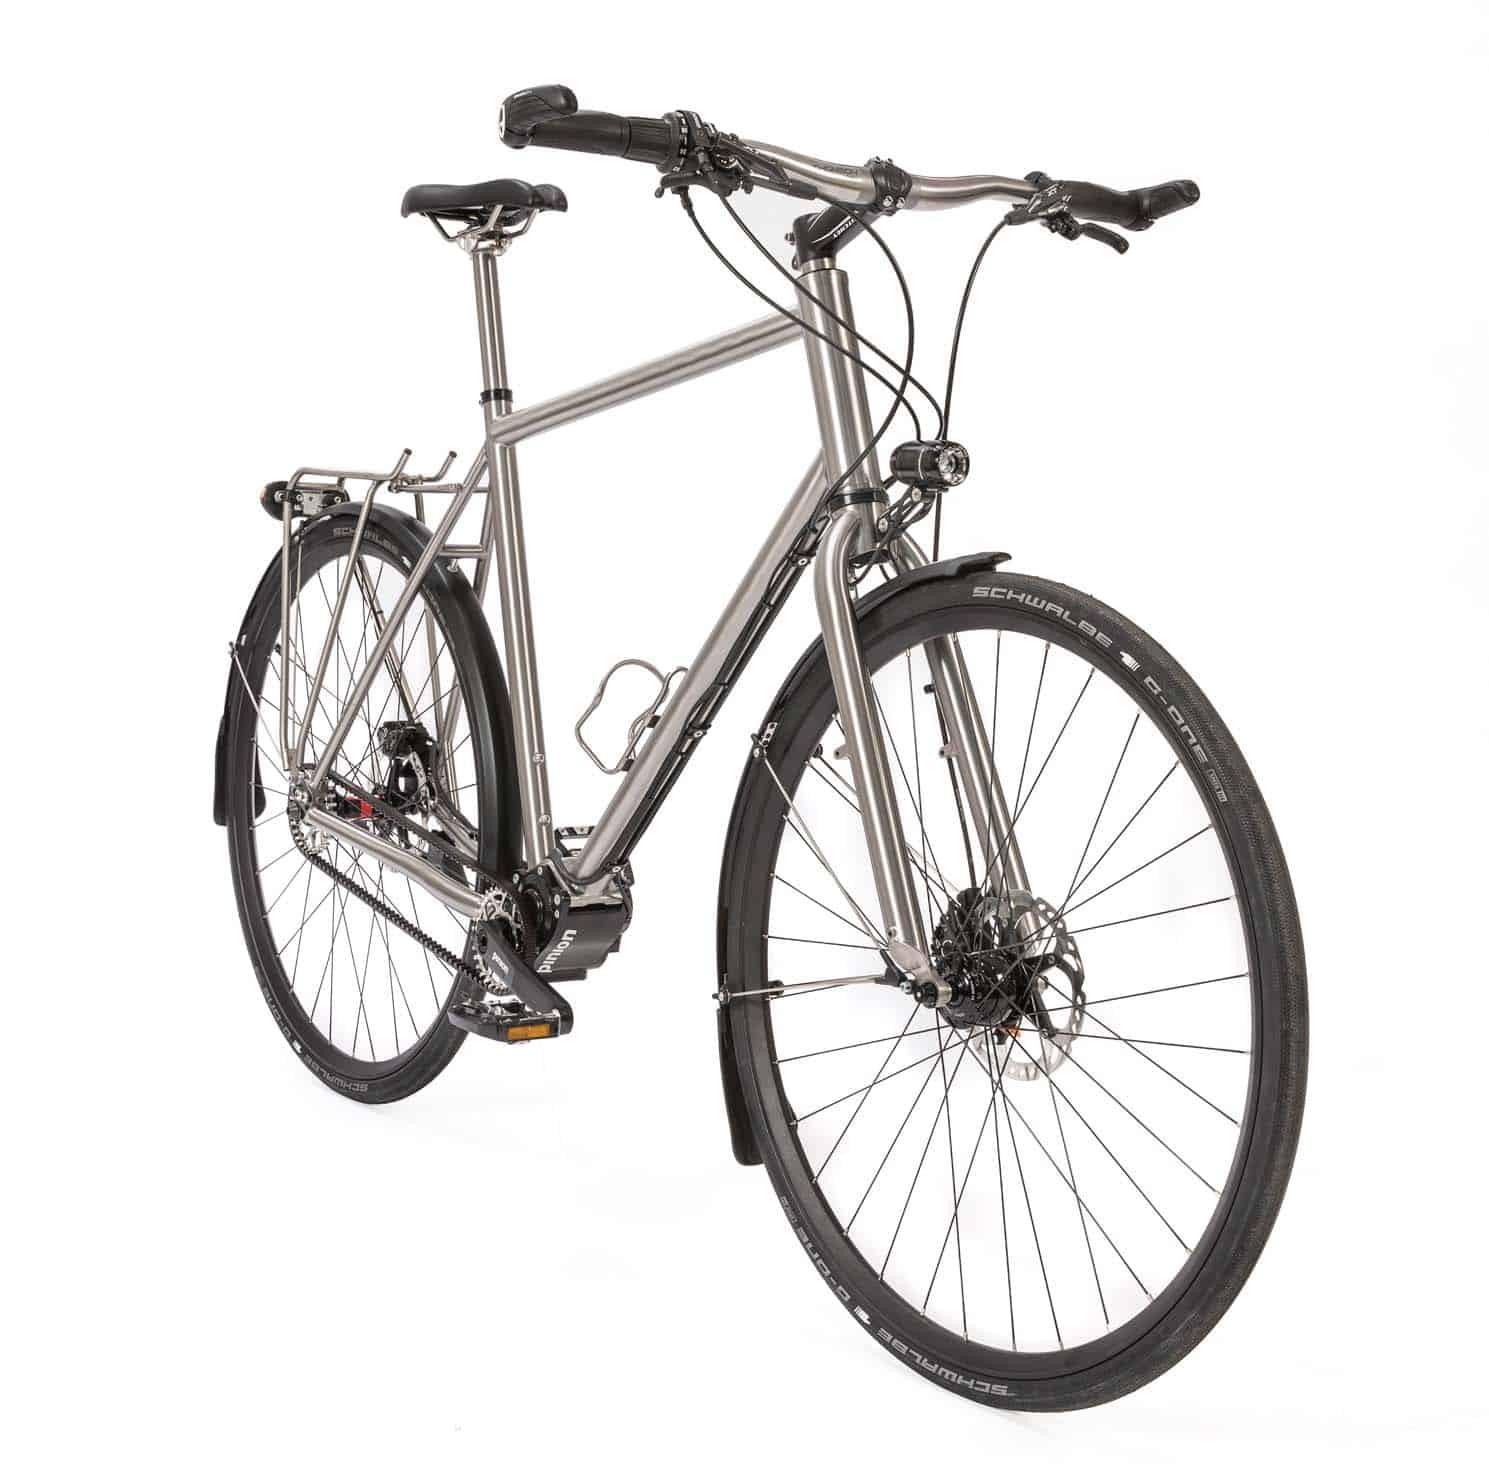 Urban_Pinion_Bike_02_min